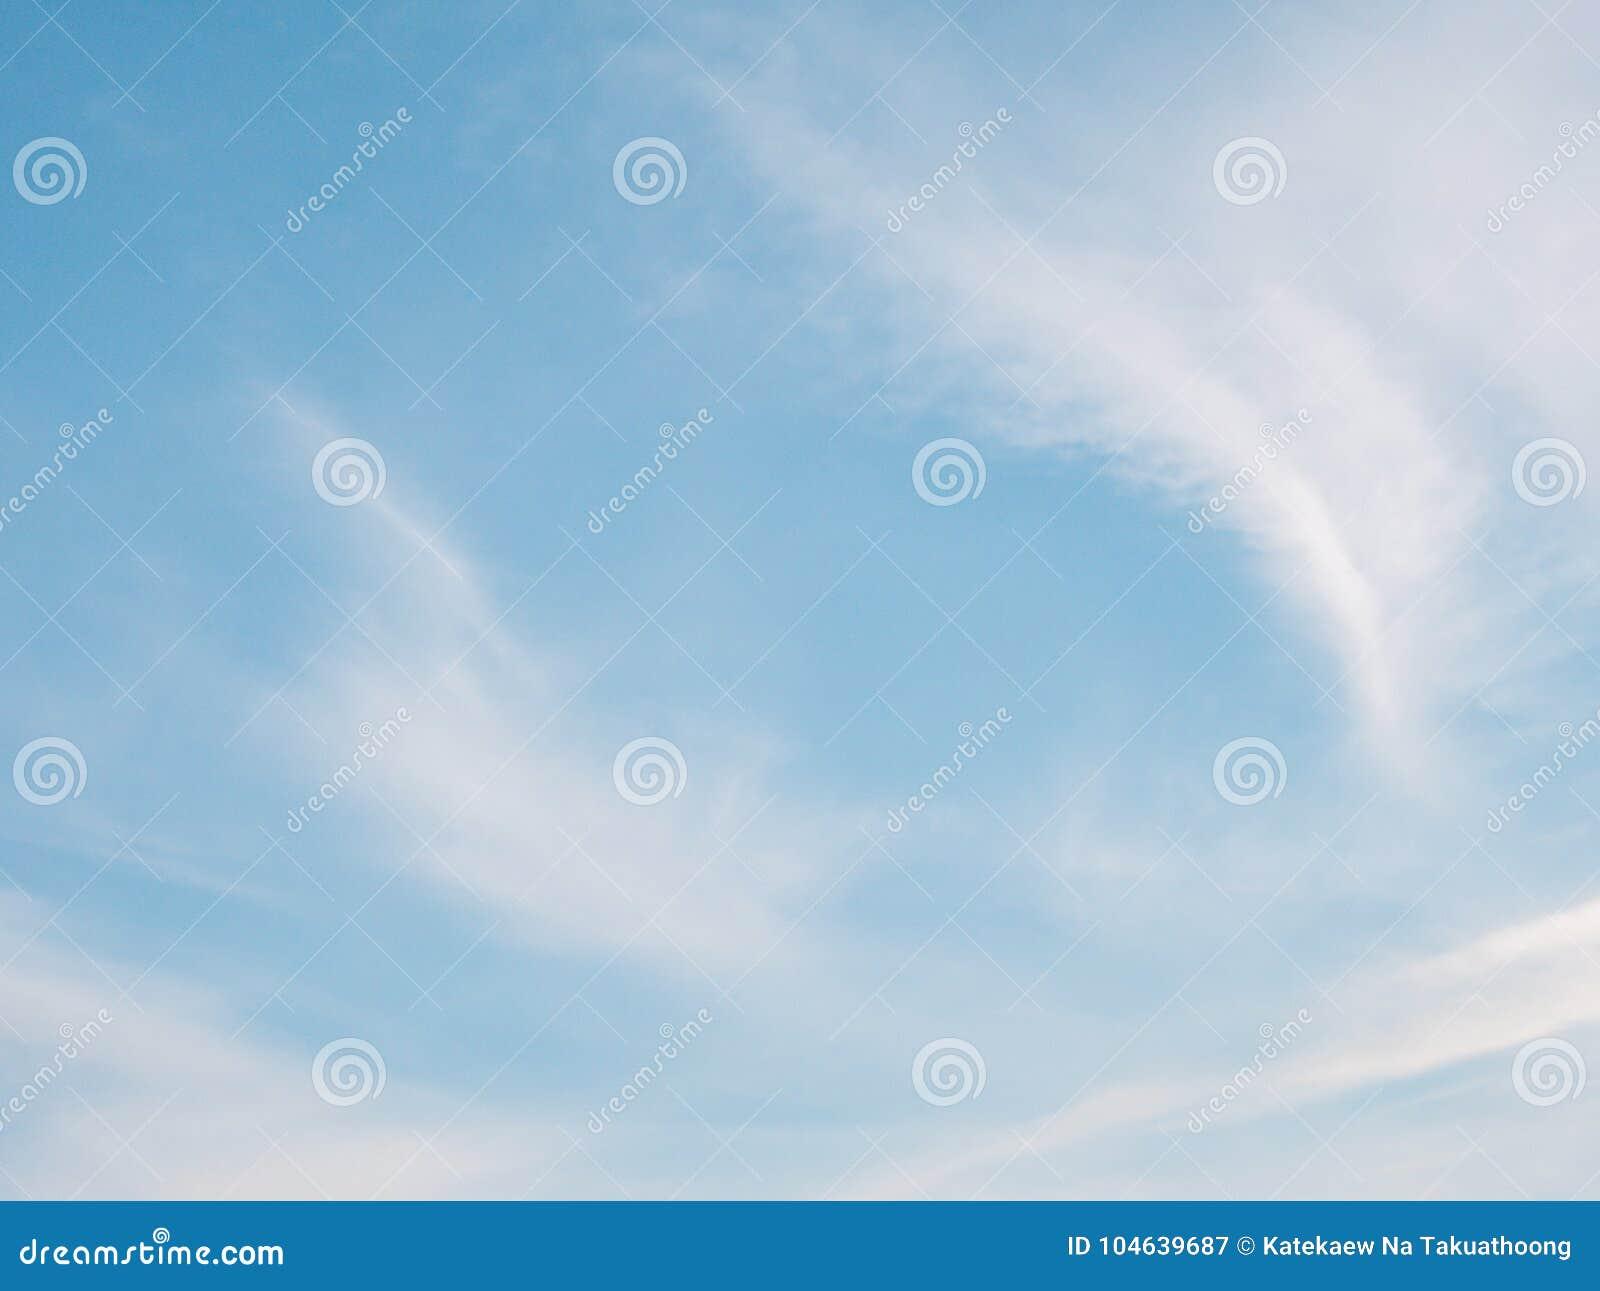 Download Mooie Bewolkte Blauwe Hemel Stock Afbeelding - Afbeelding bestaande uit wolk, kleur: 104639687